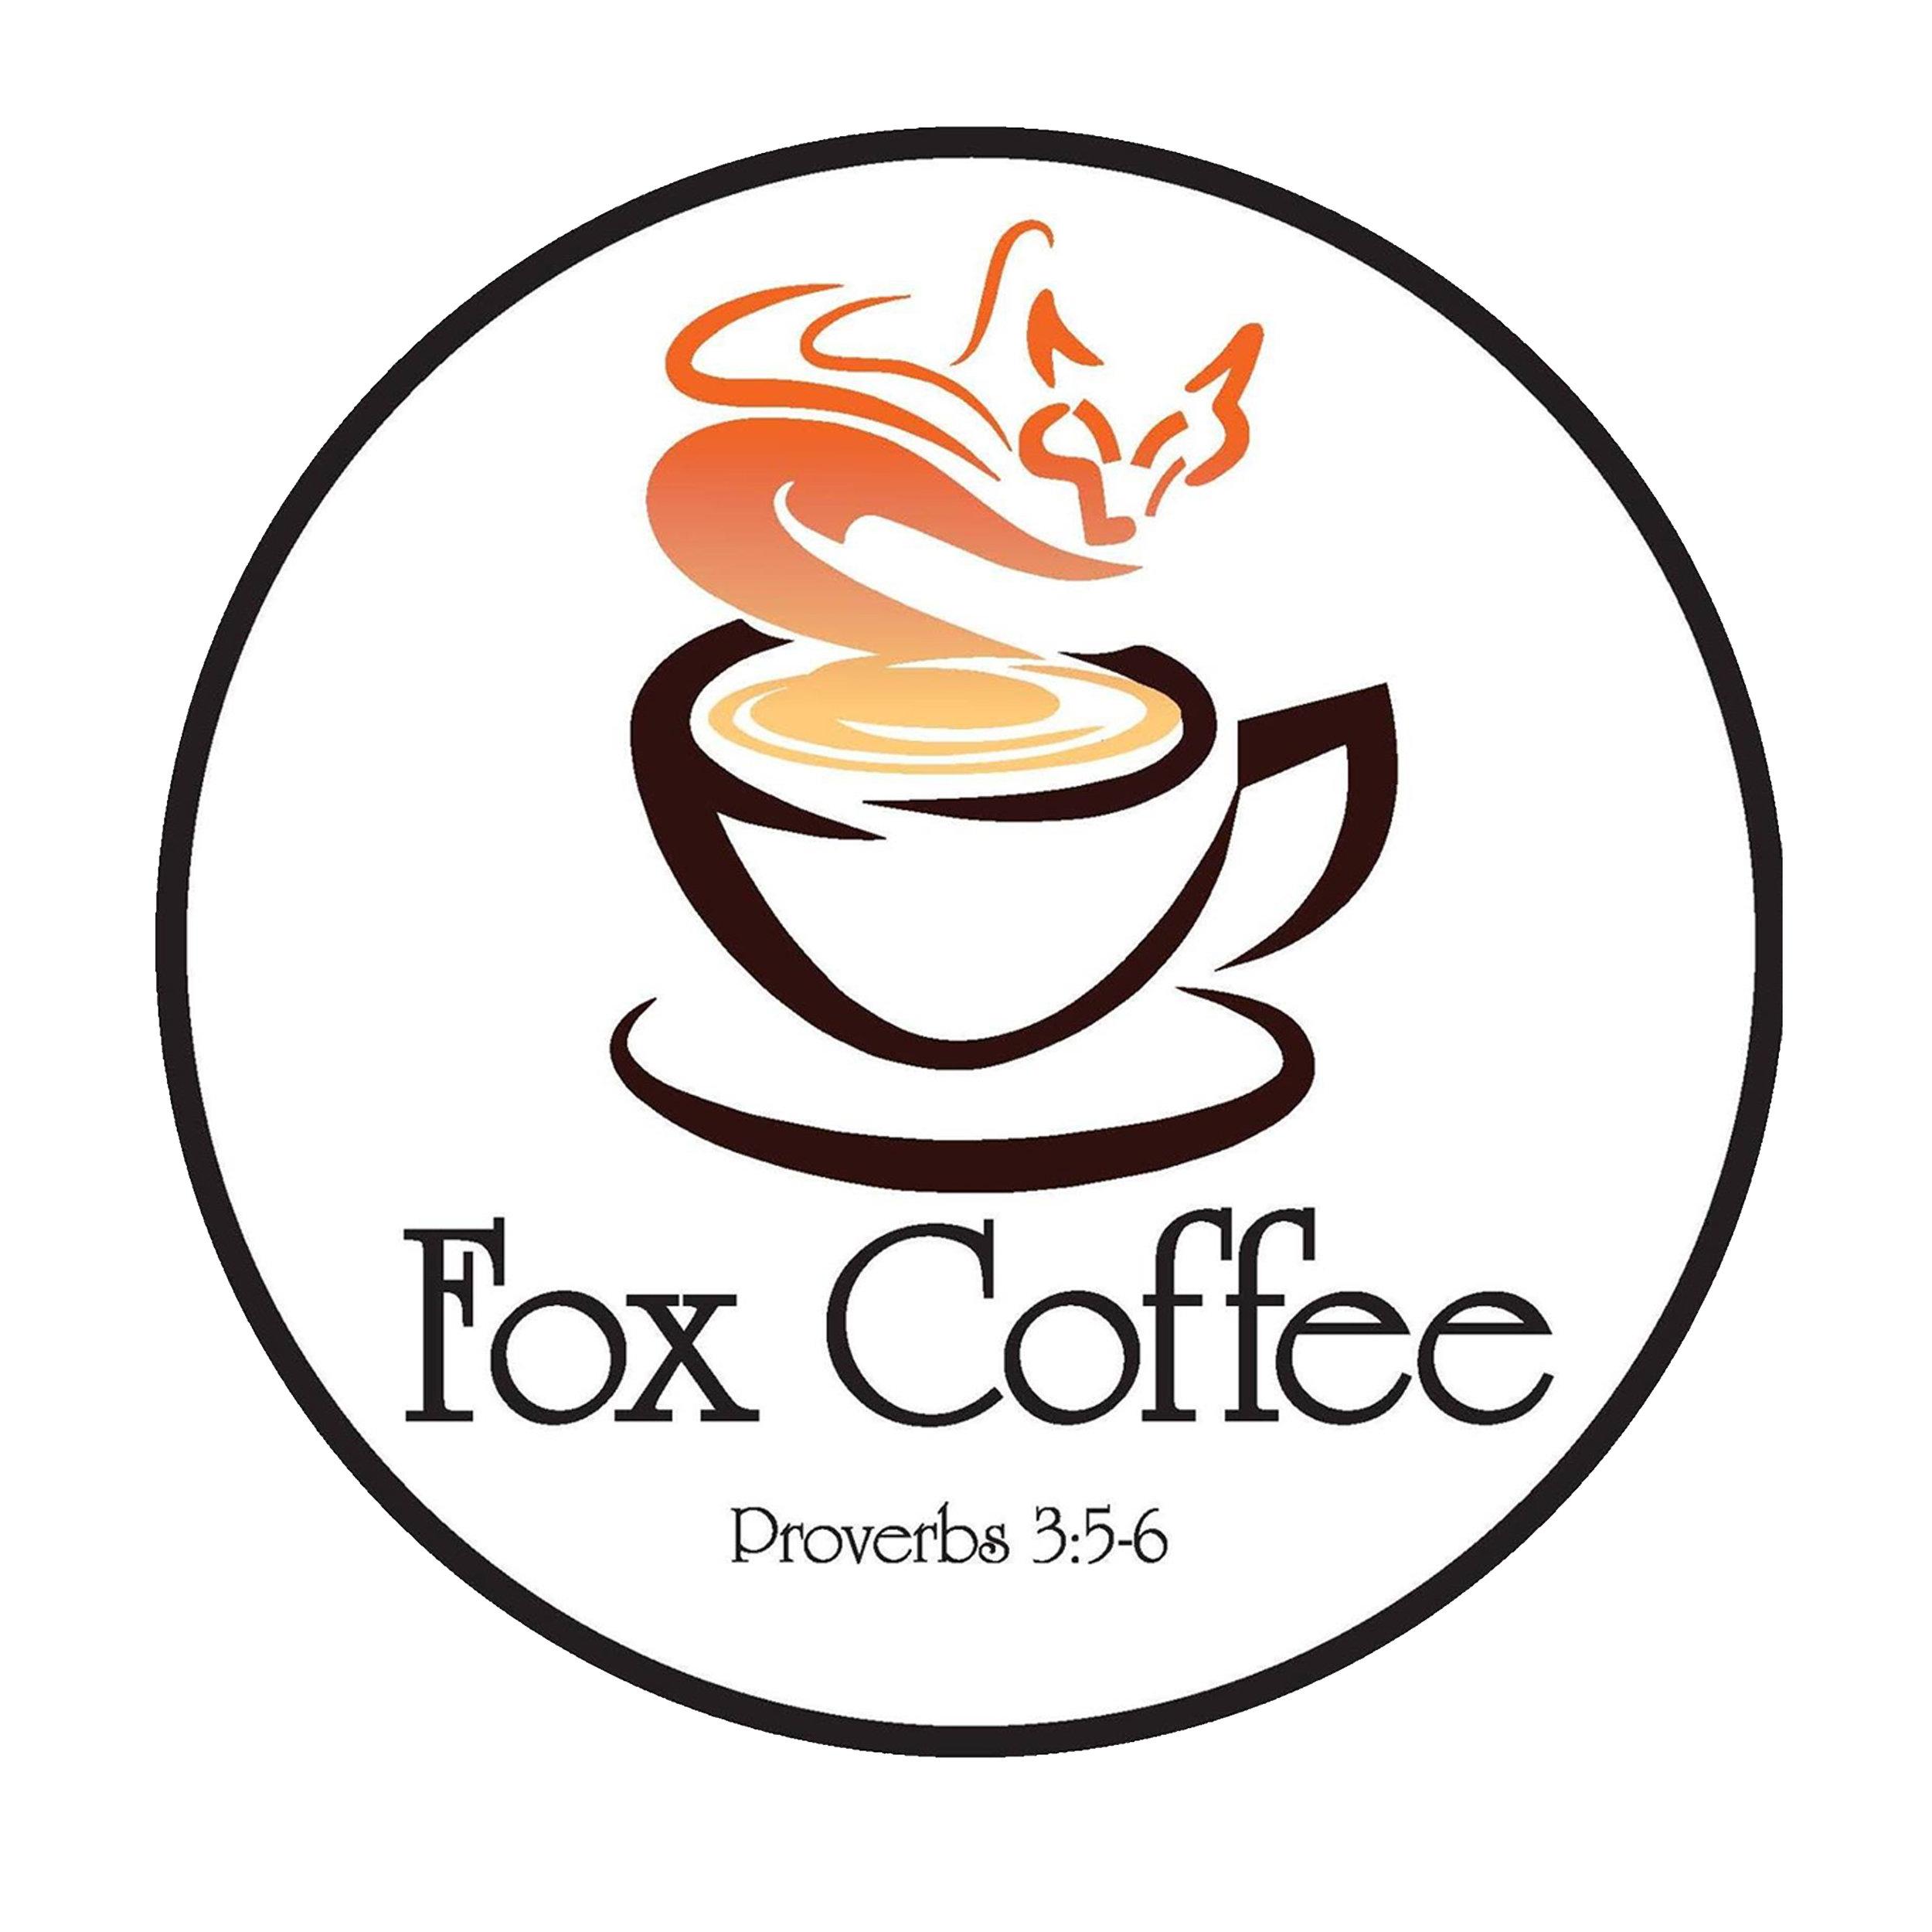 foxcoffeelogo.jpg